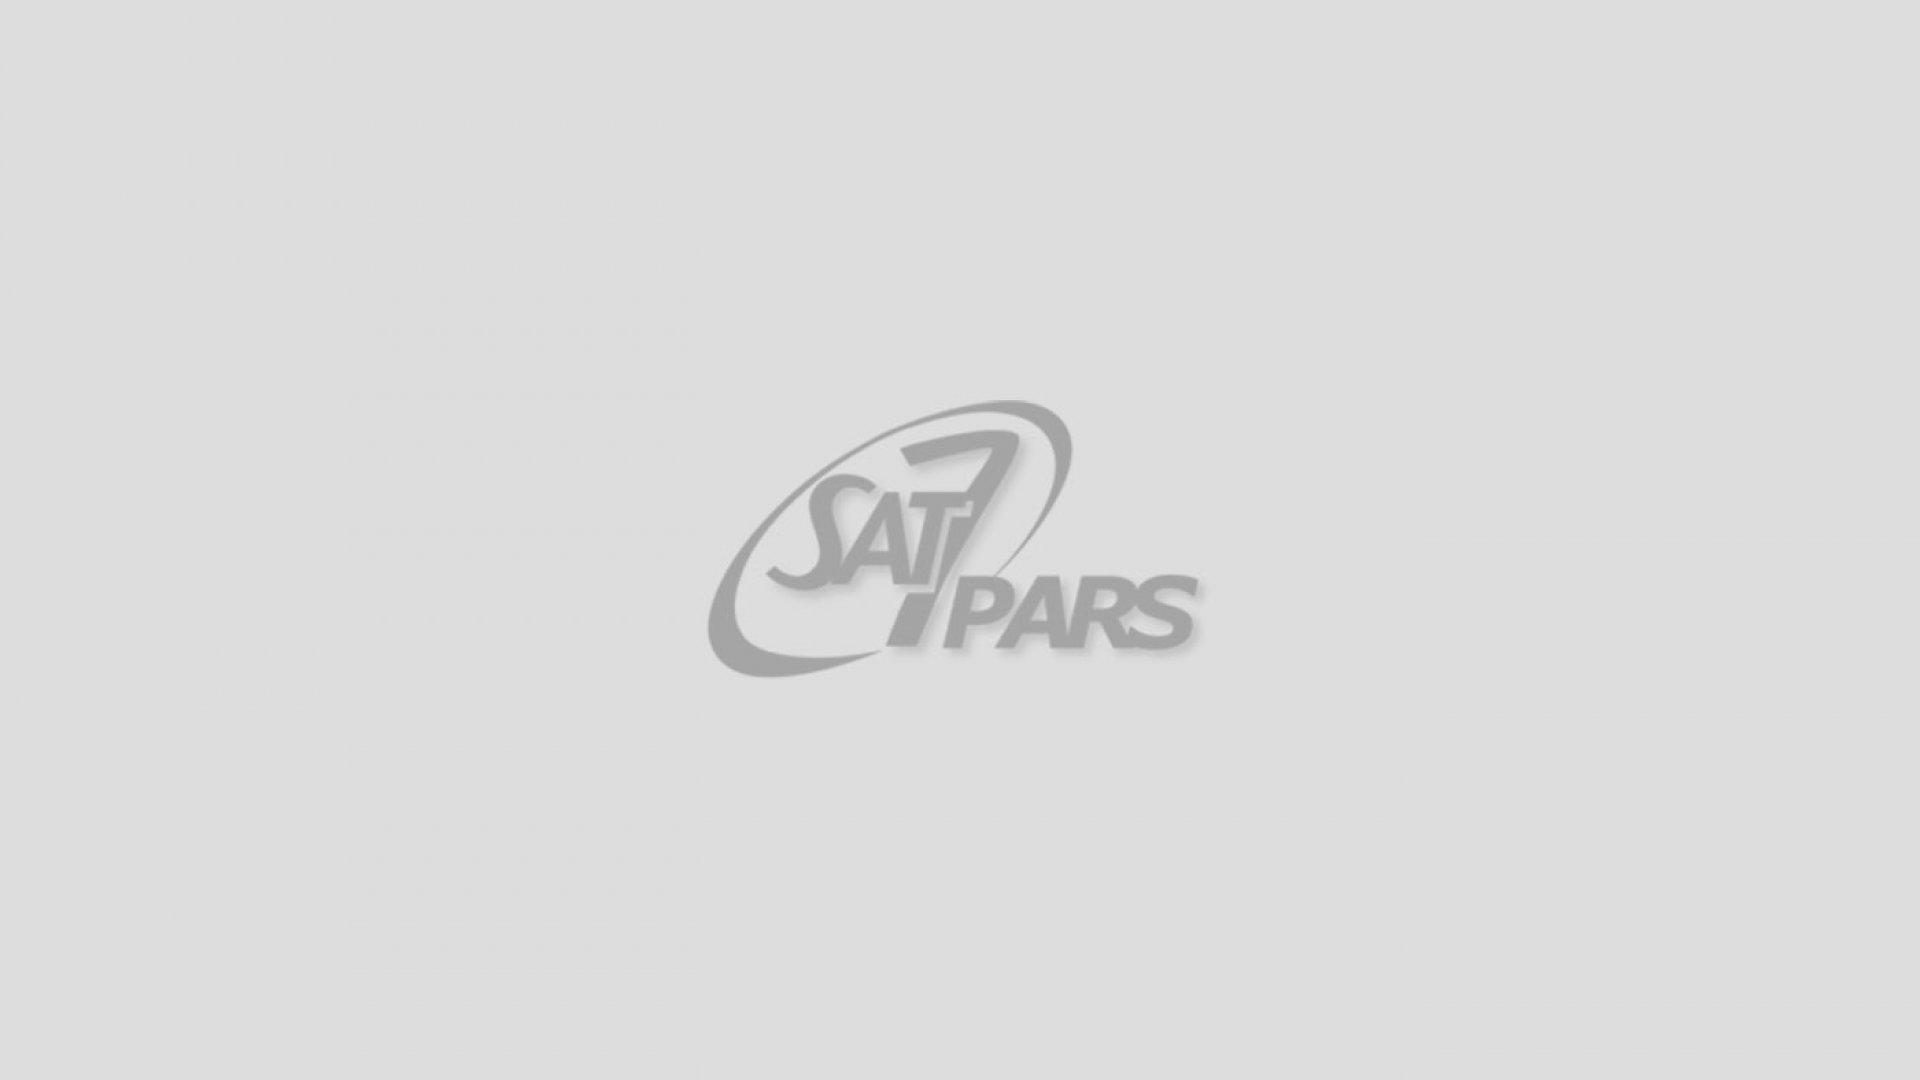 Insiders - SAT-7 PARS